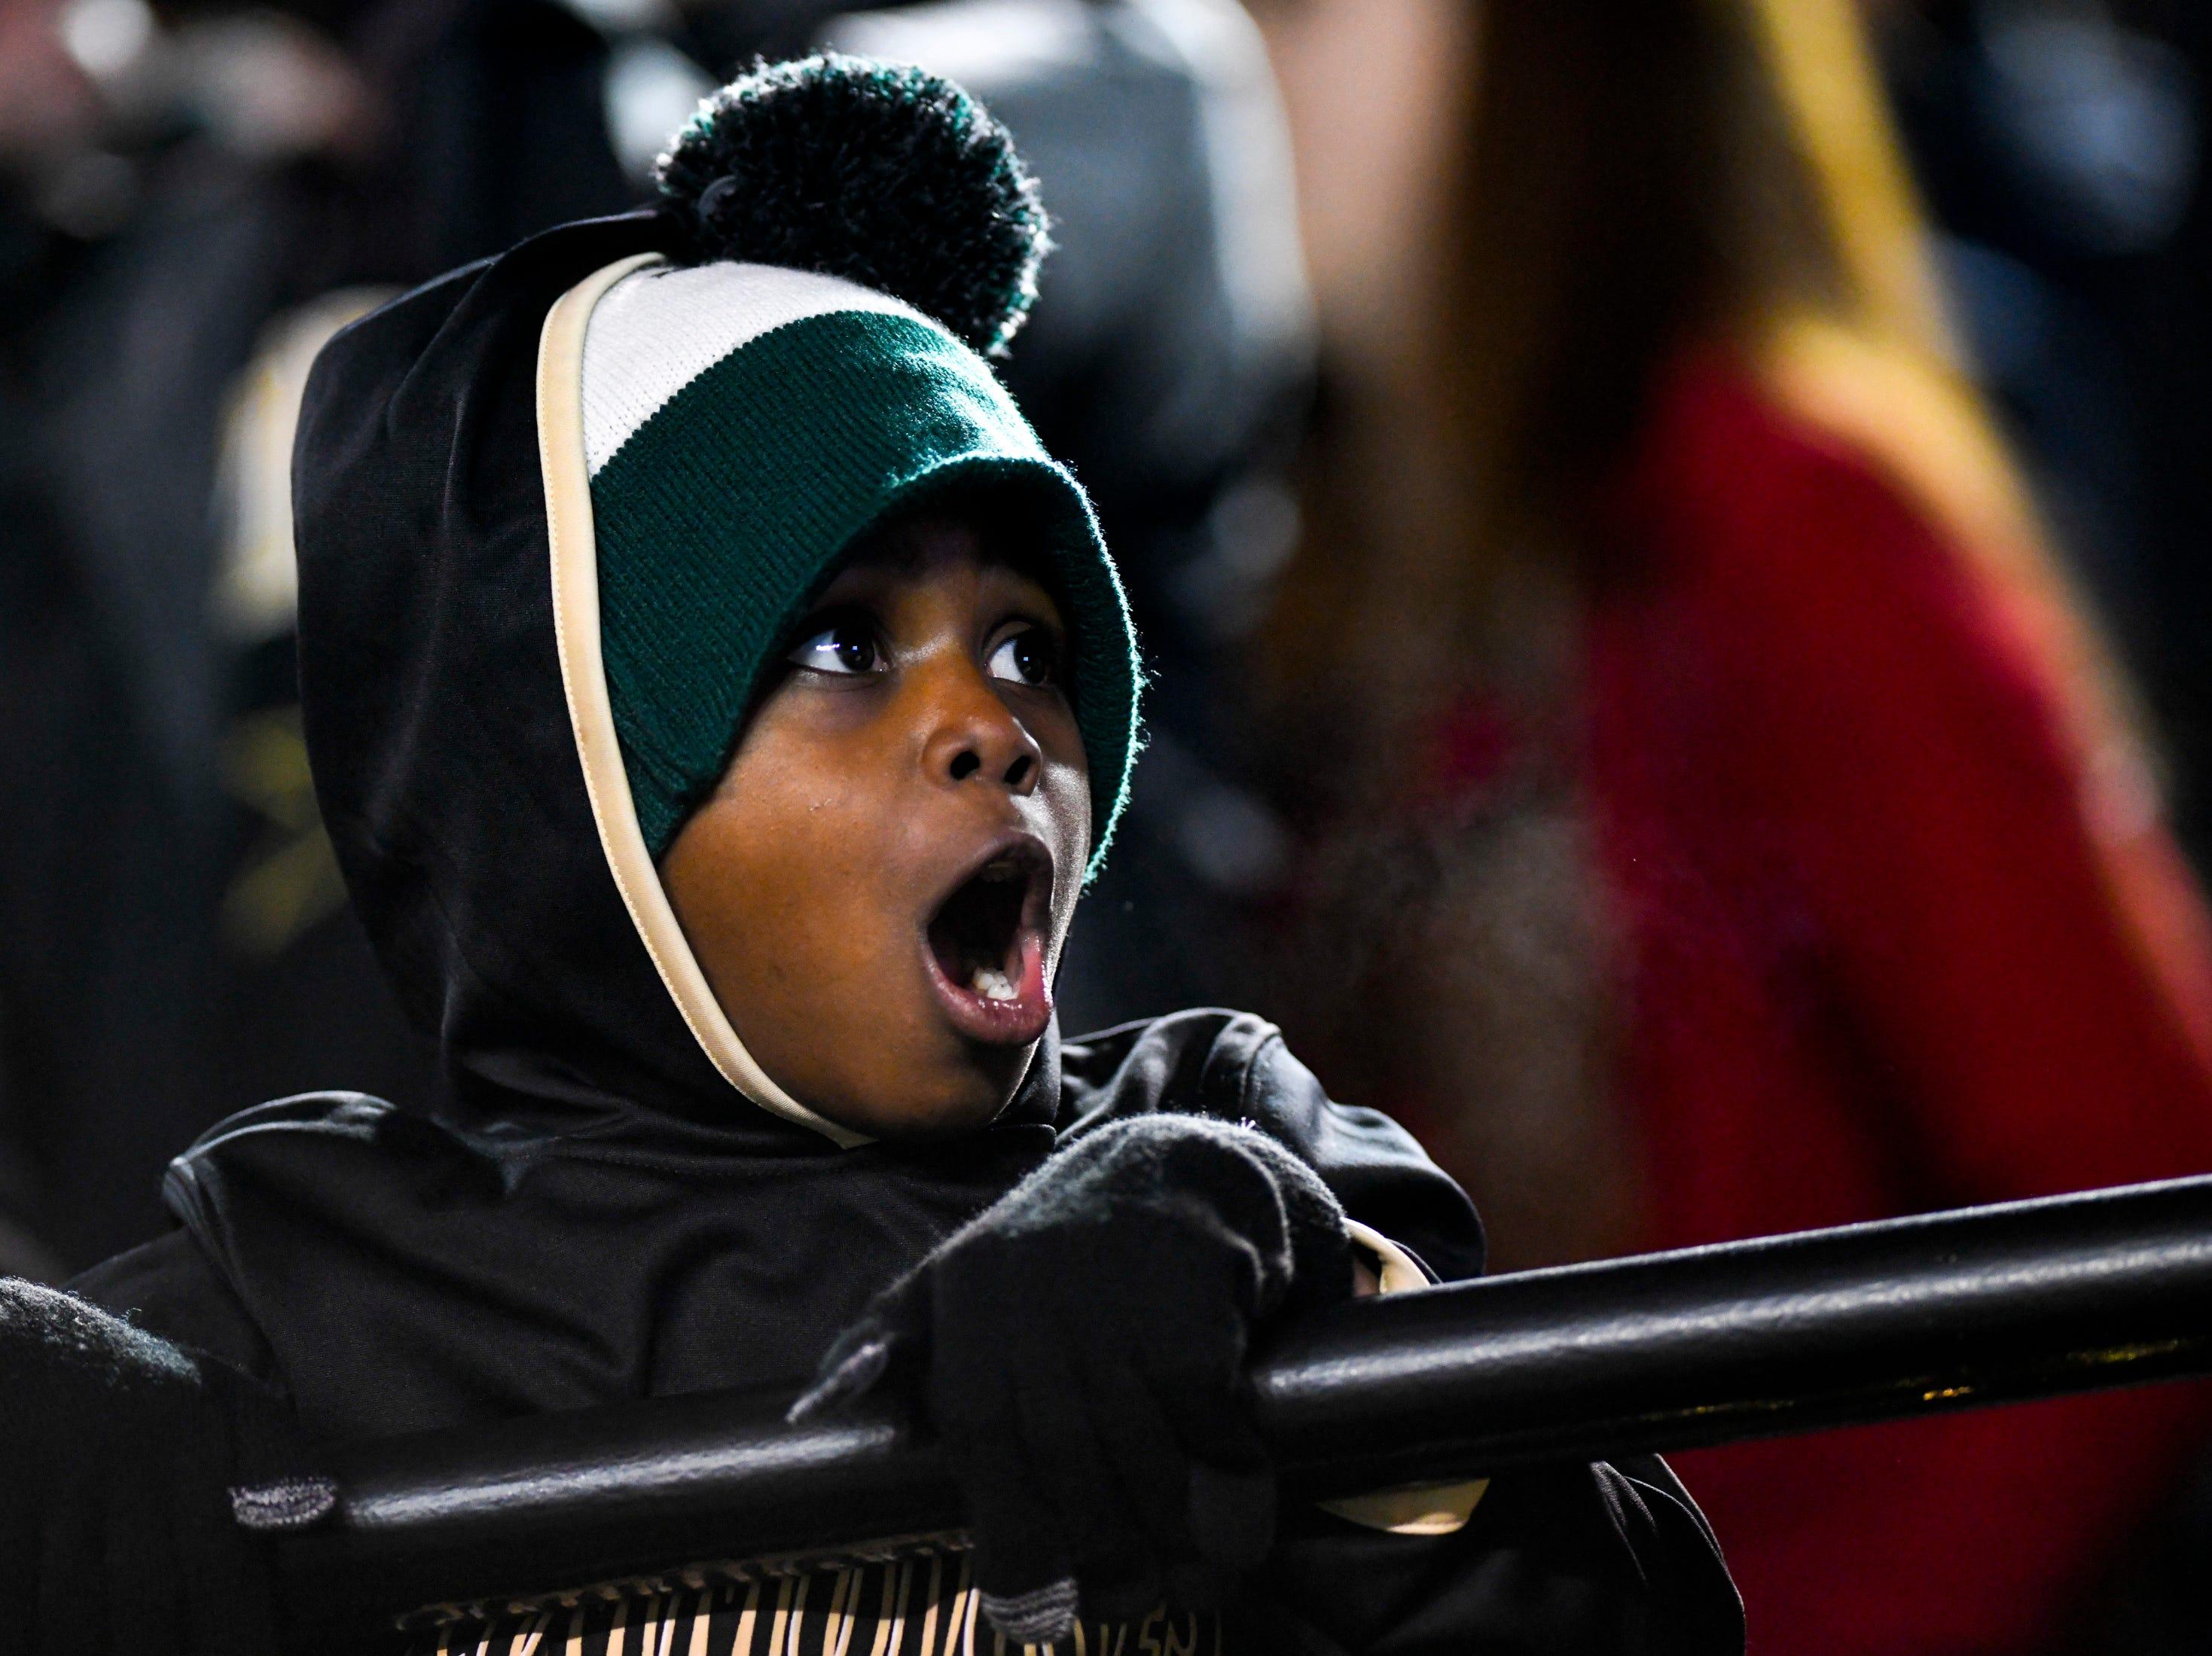 Elijah Oliver, 7, reacts to the play on the field during Vanderbilt's game against Ole Miss at Vanderbilt Stadium in Nashville on Saturday, Nov. 17, 2018.